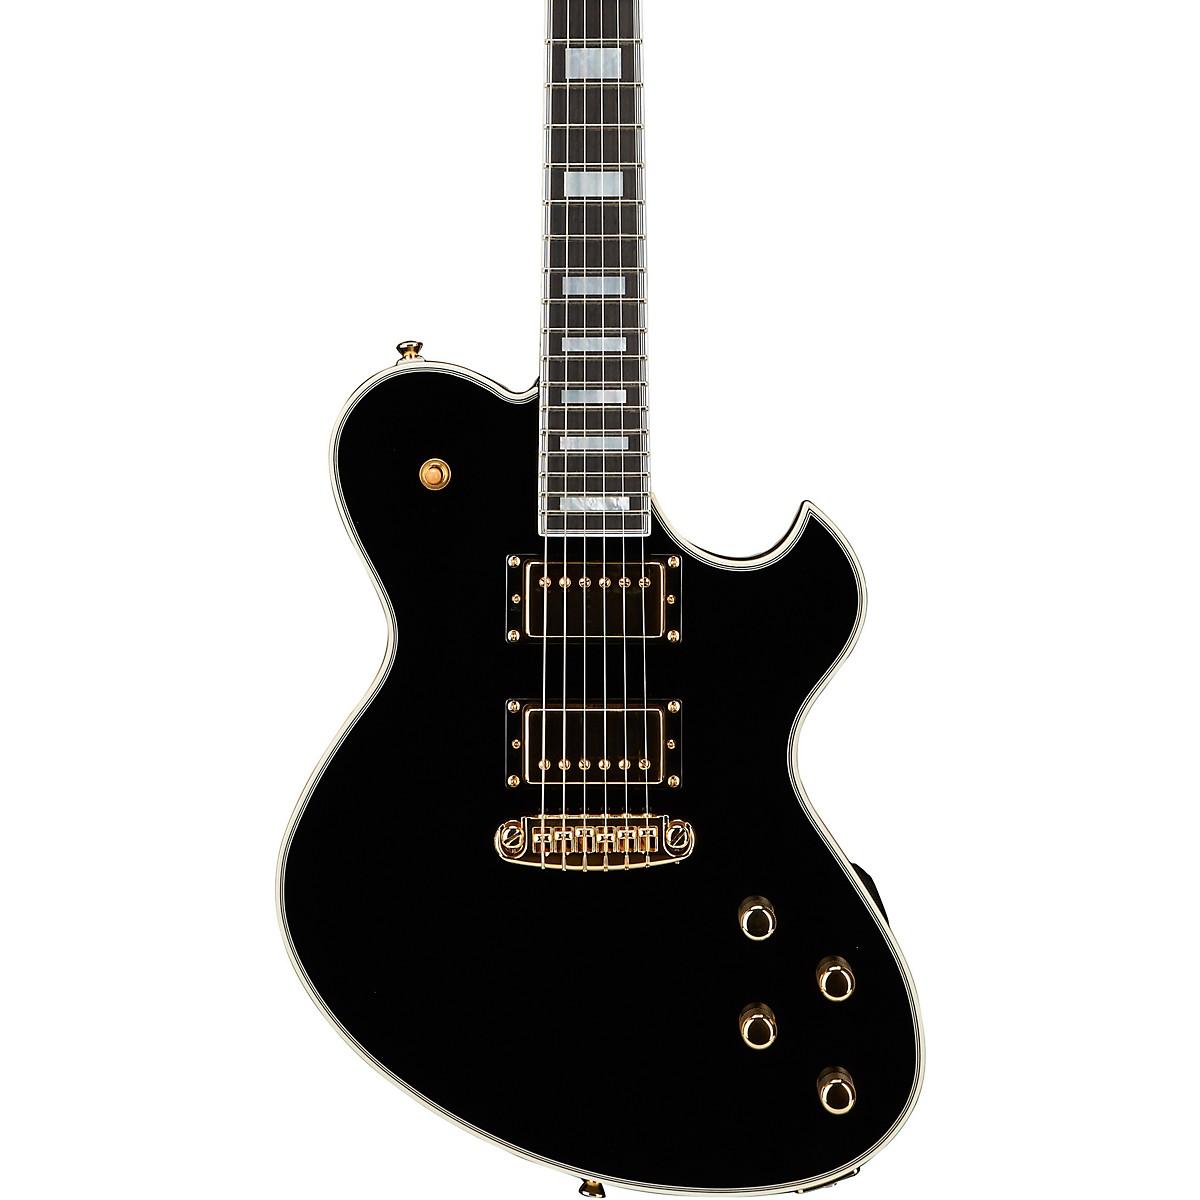 Newman Guitars Custom Electric Guitar